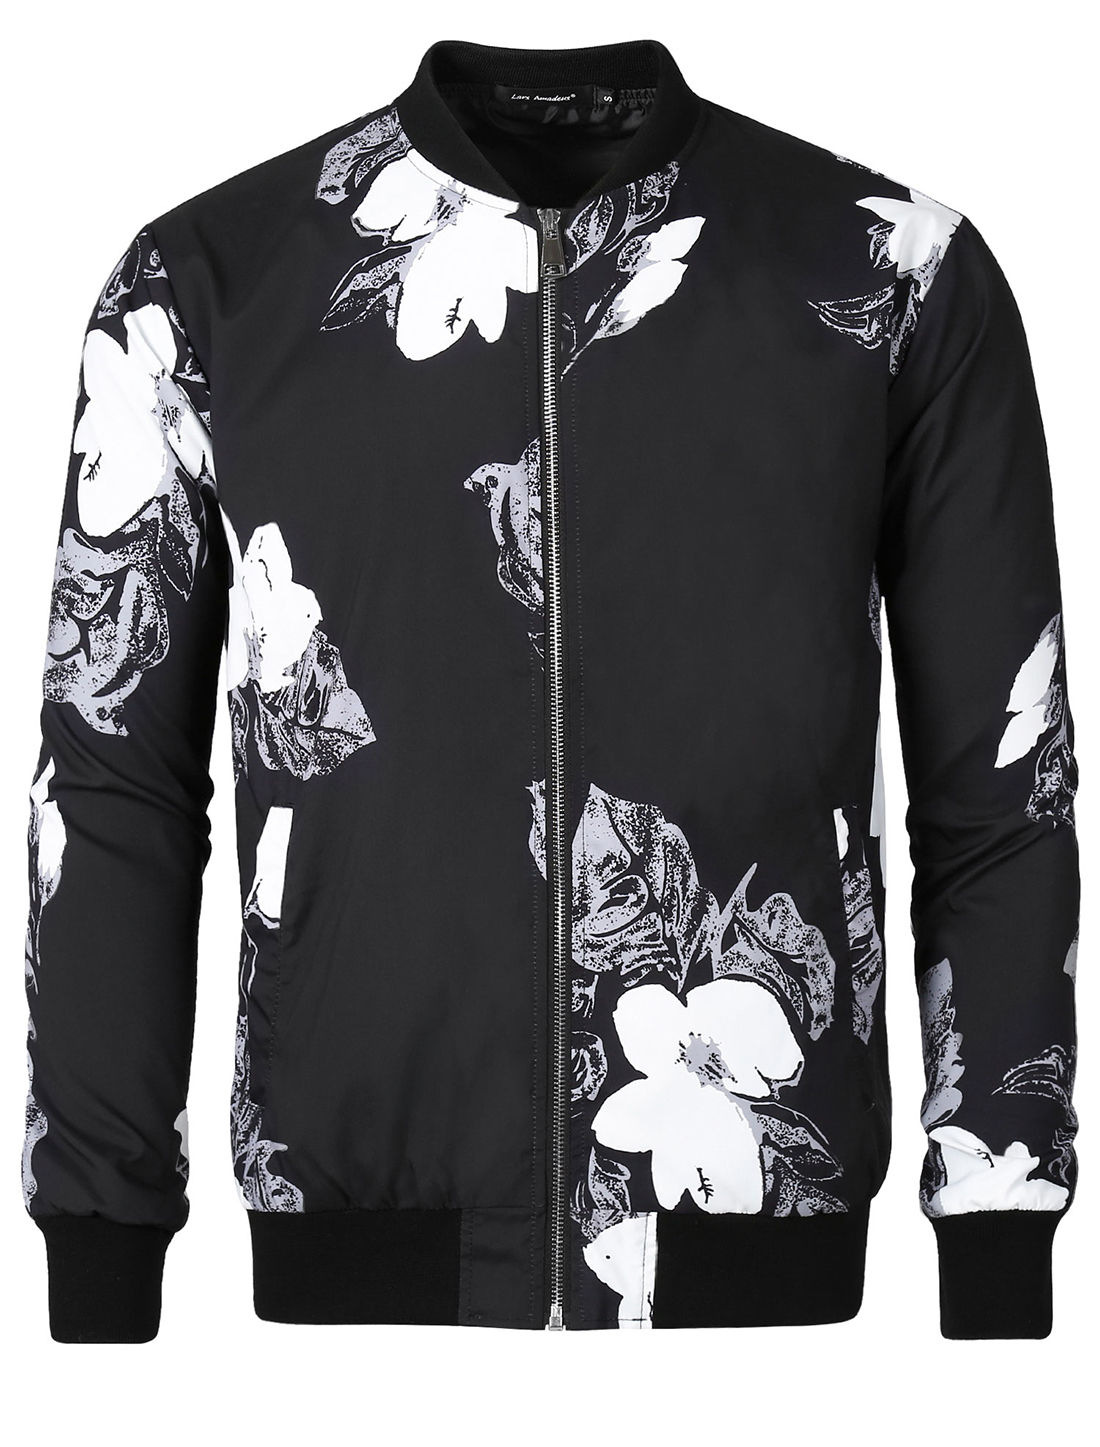 Men Bomber Jacket Floral Print Zipper Casual Lightweight Jackets Black XXLarge